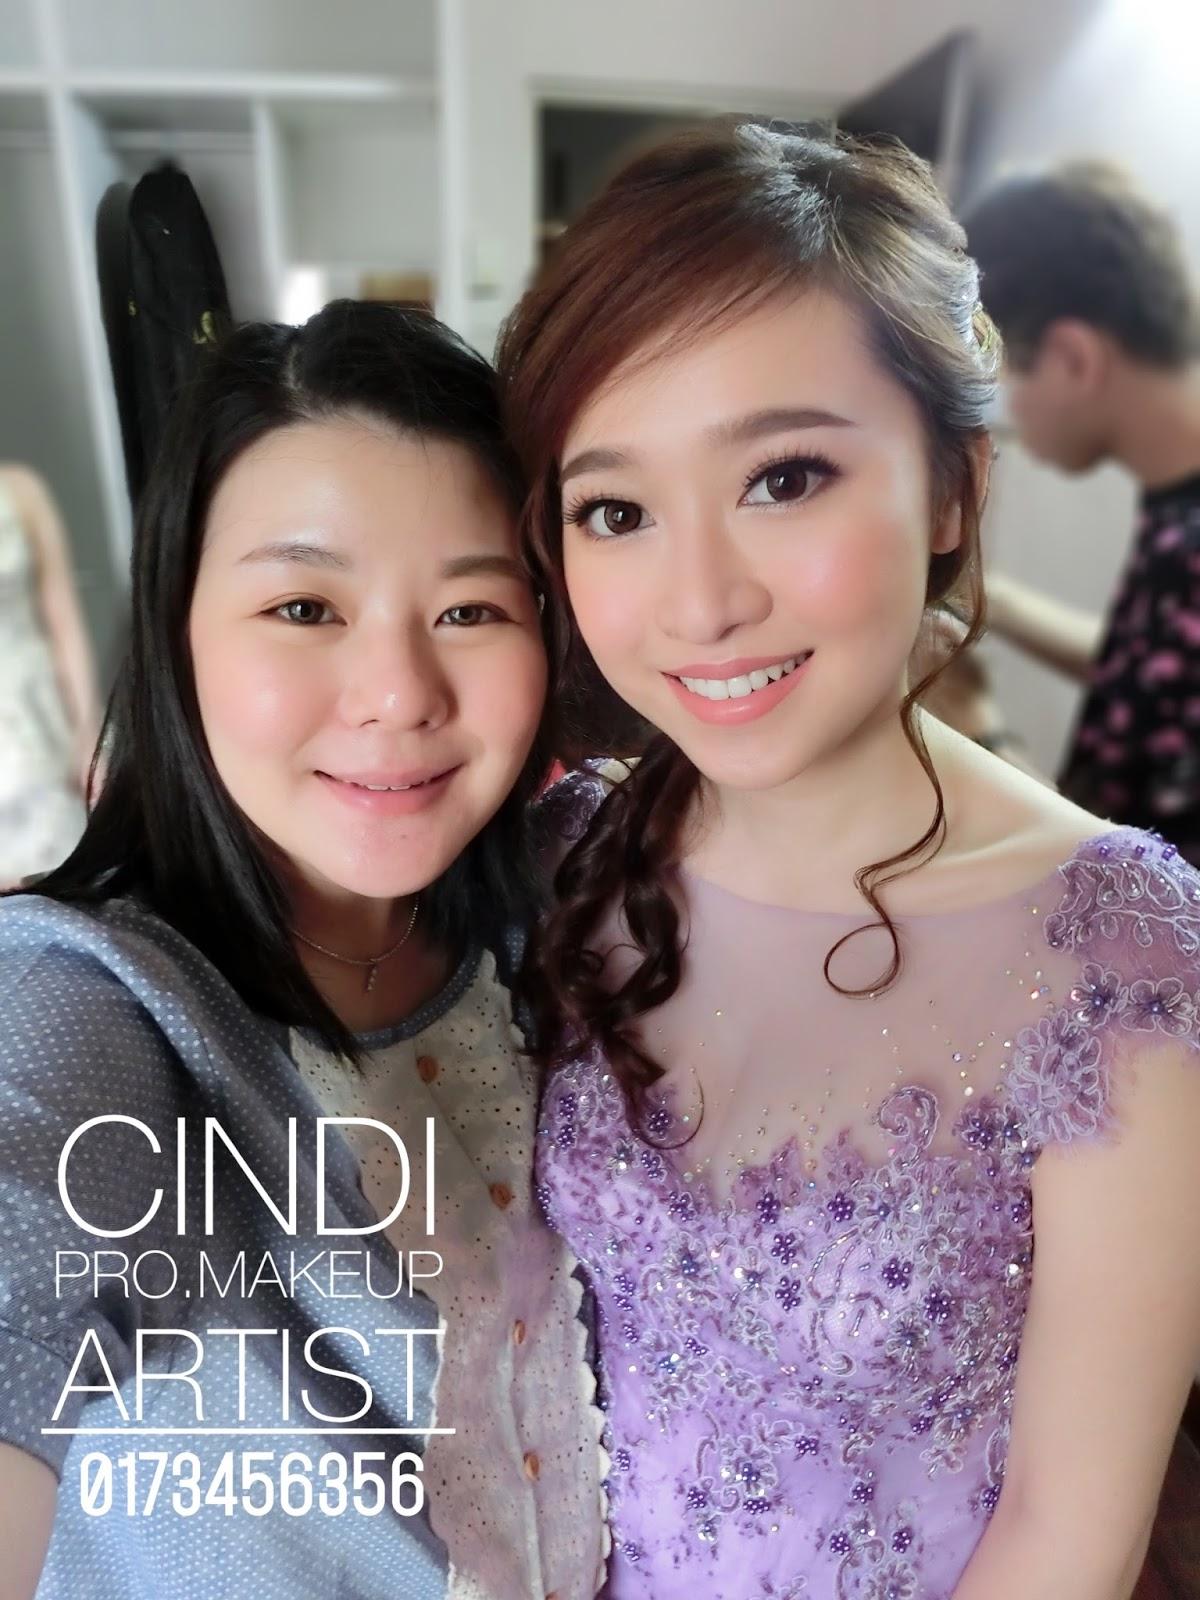 Cindi Pro Makeup Artist Commercial Photoshoot Makeup